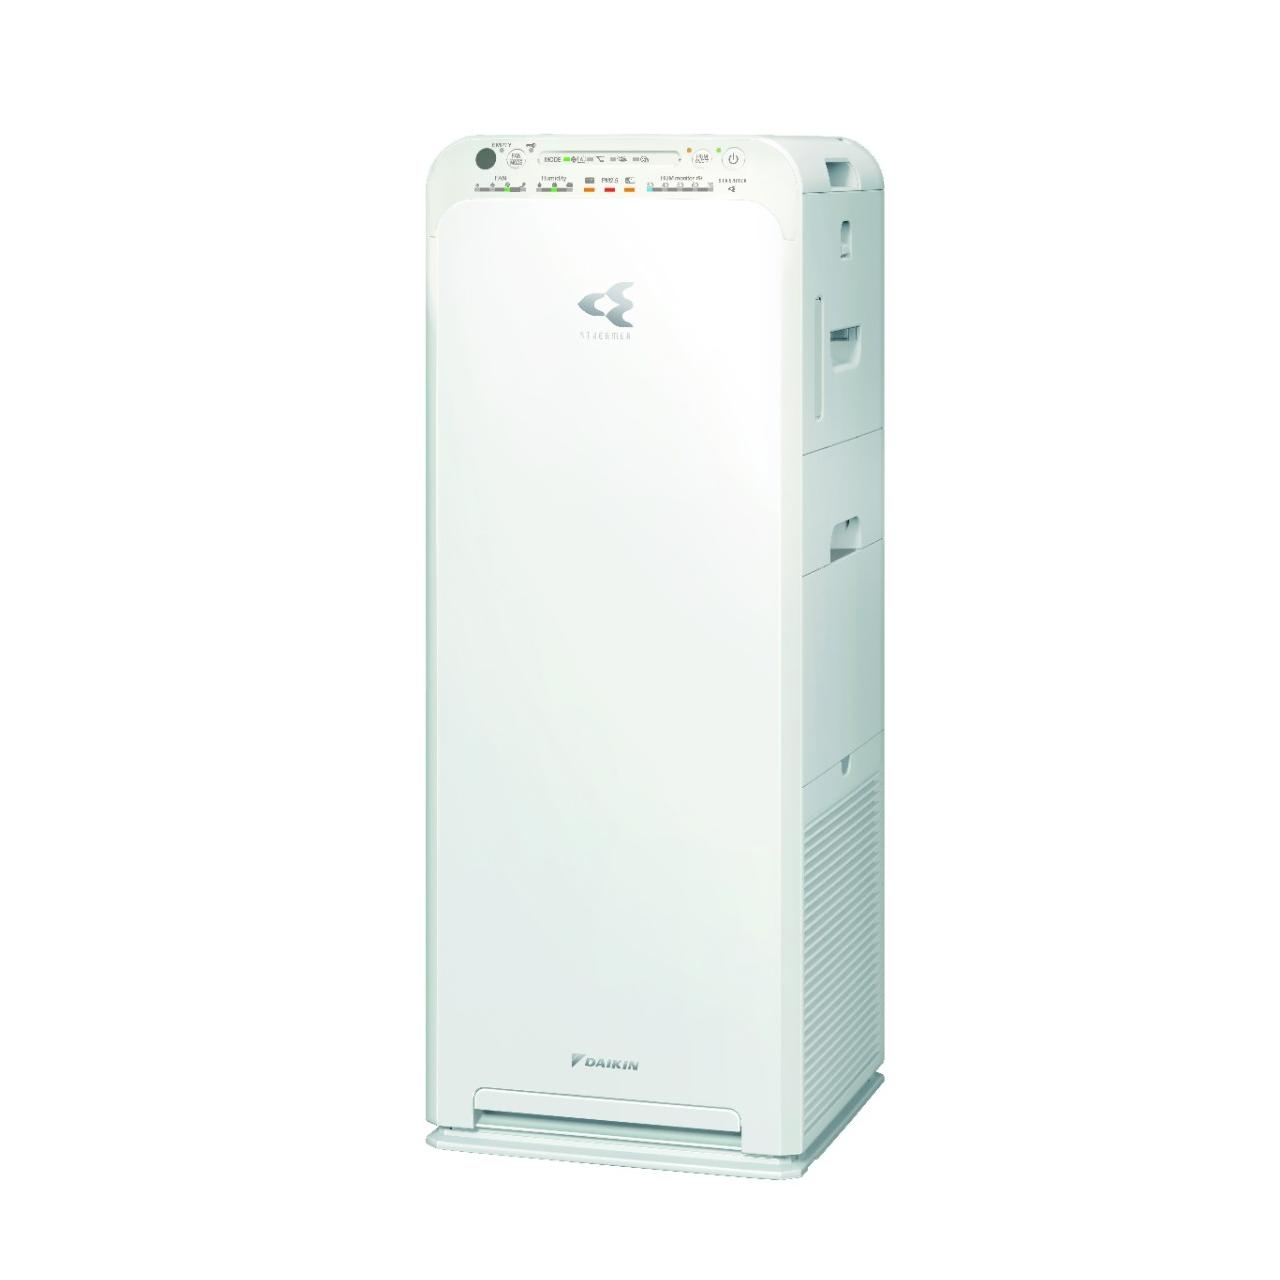 Daikin prečistač I ovalživač vazduha MCK55W - Inelektronik